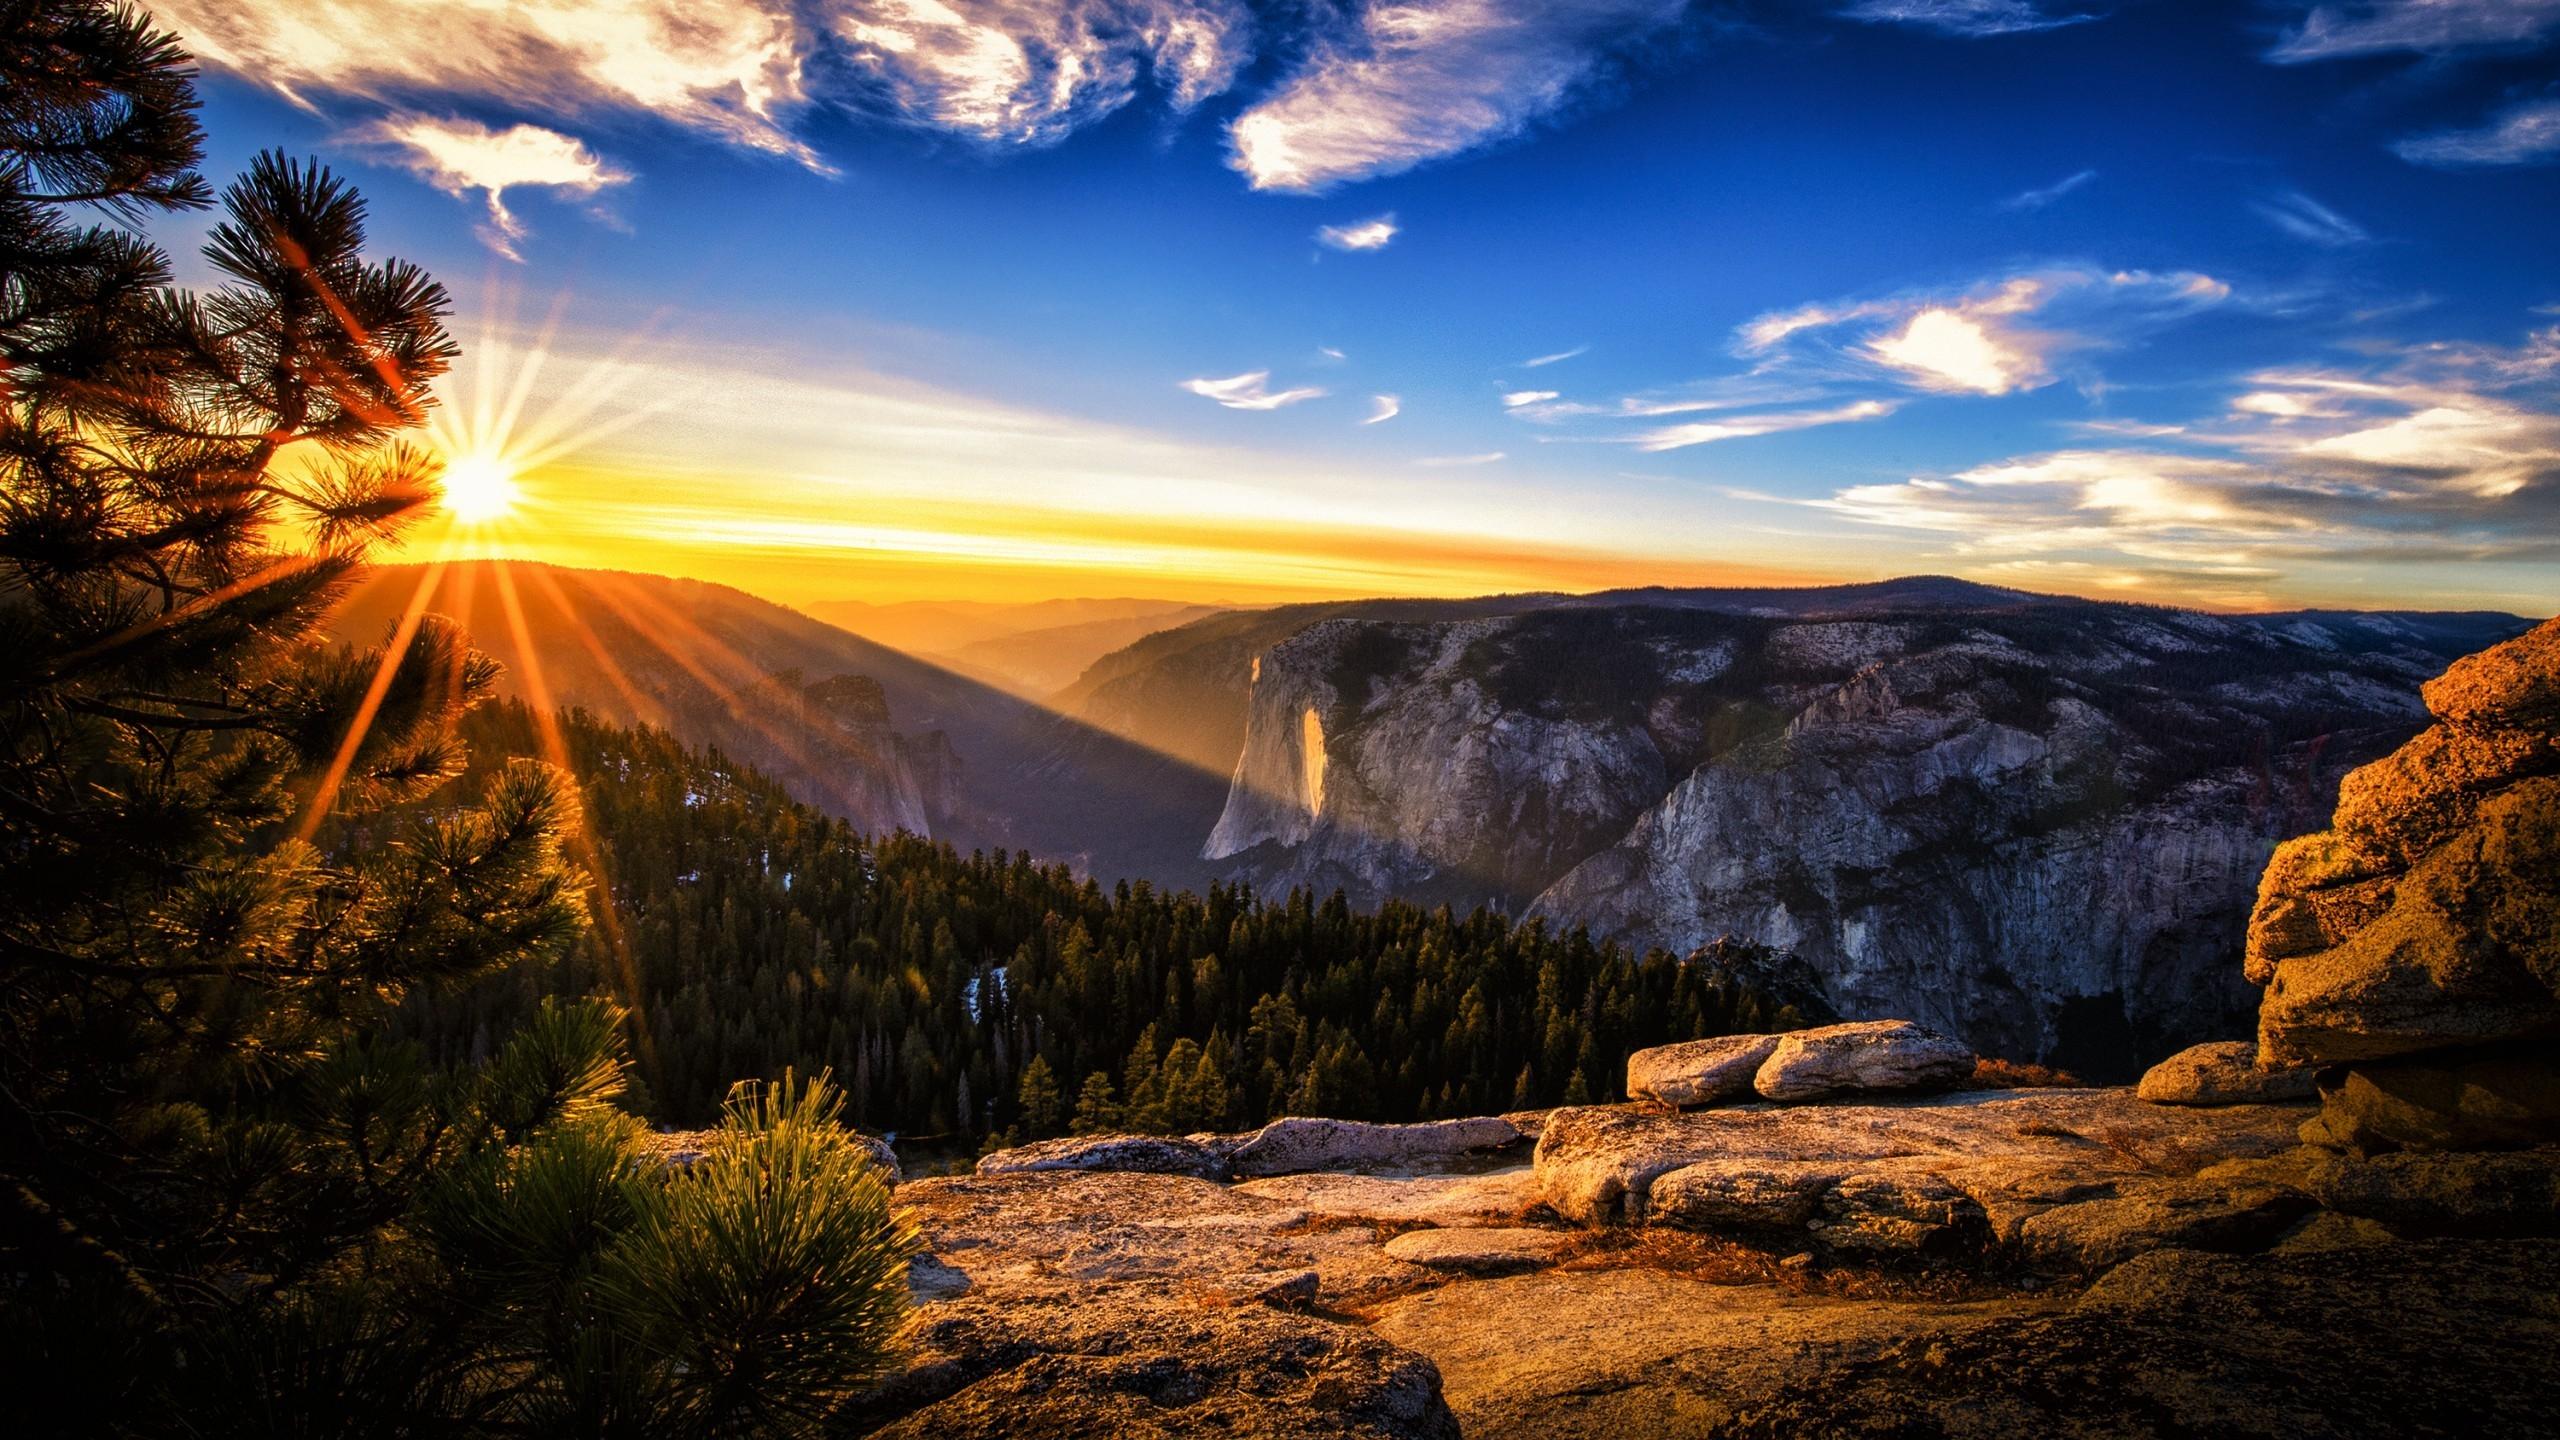 Bright Sunshine Landscape For Hdtv Resolution Mountain Sunset Background 2560x1440 Wallpaper Teahub Io